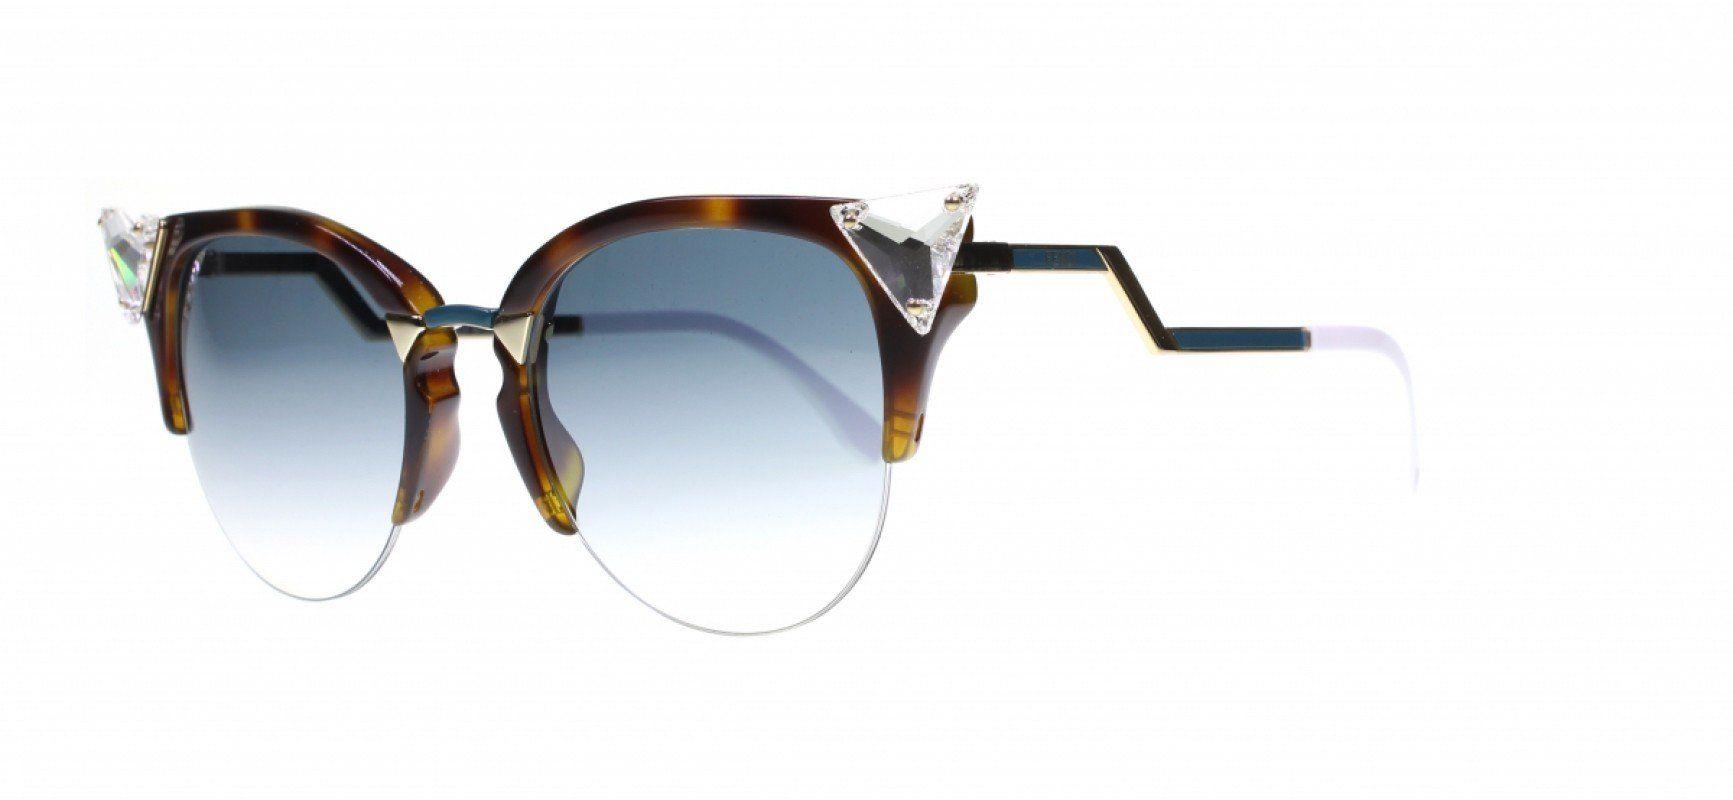 Buy awesome fendi ff0041 s vio havana gold sunglasses